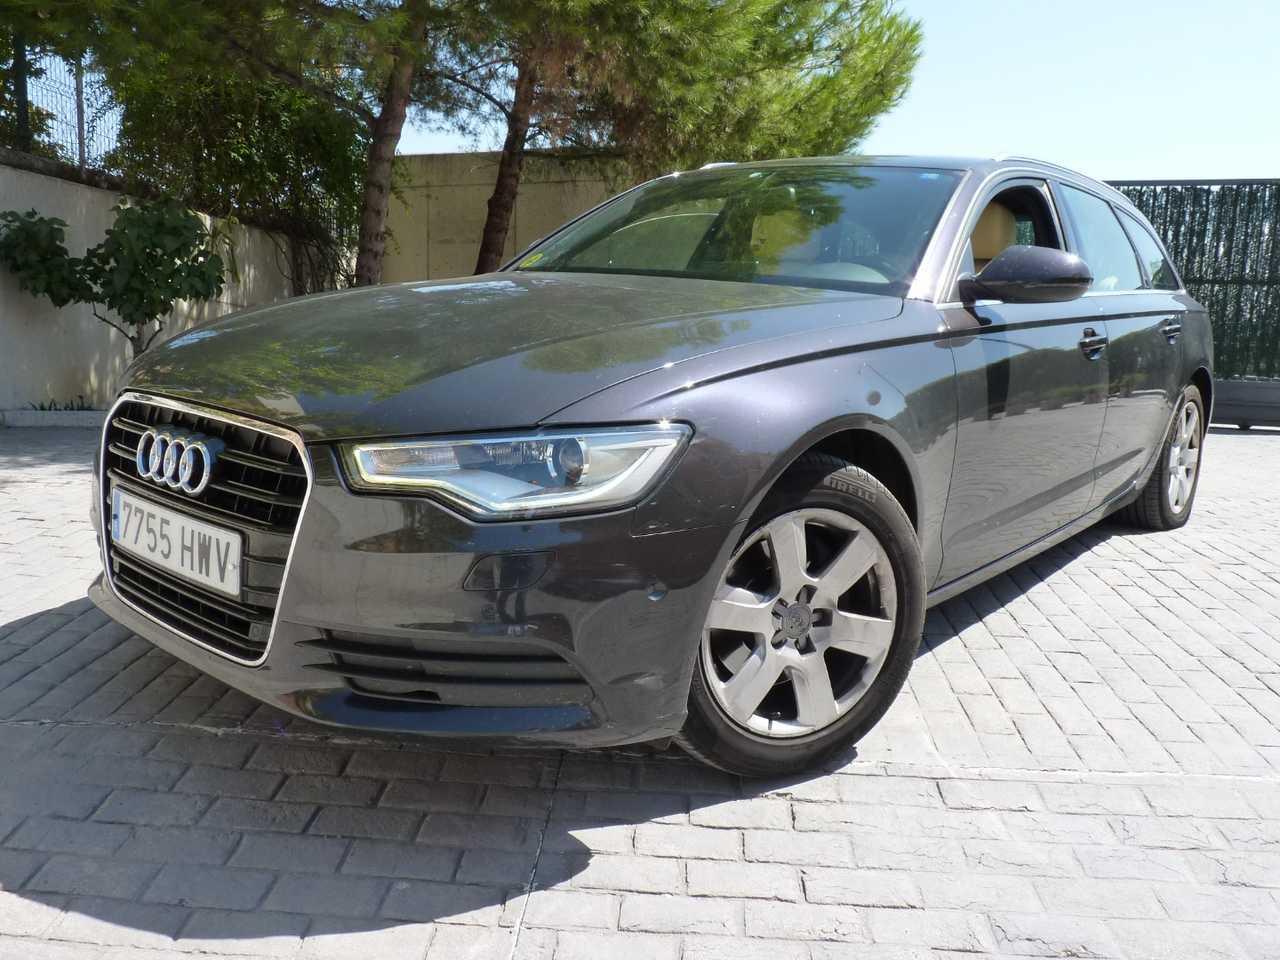 Audi A6 Avant 2.0 TDI ADVANCE EDITION  MULTITRONIC   - Foto 1